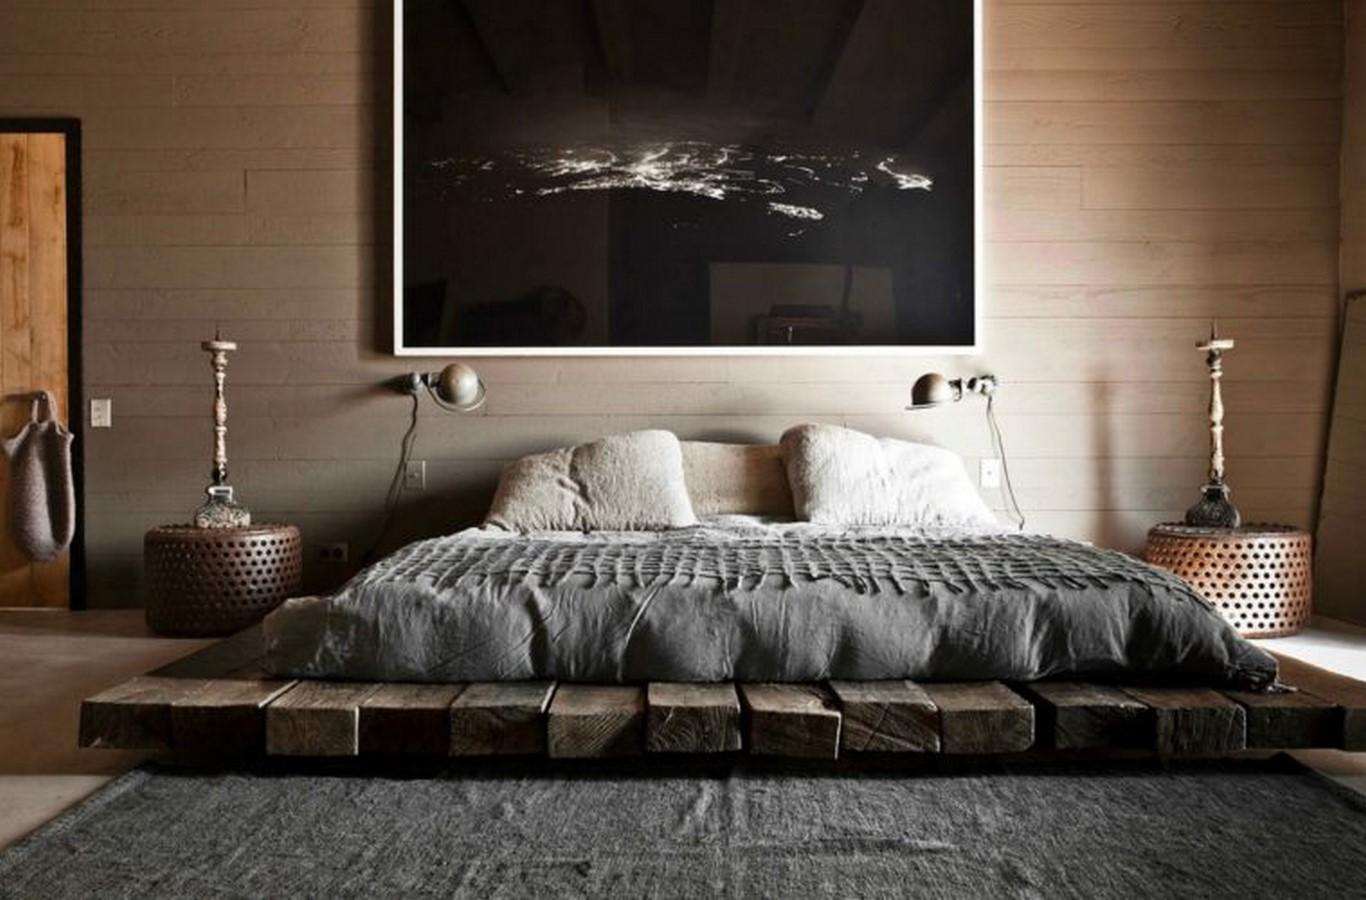 20 Futuristic bedroom interior ideas - Sheet11